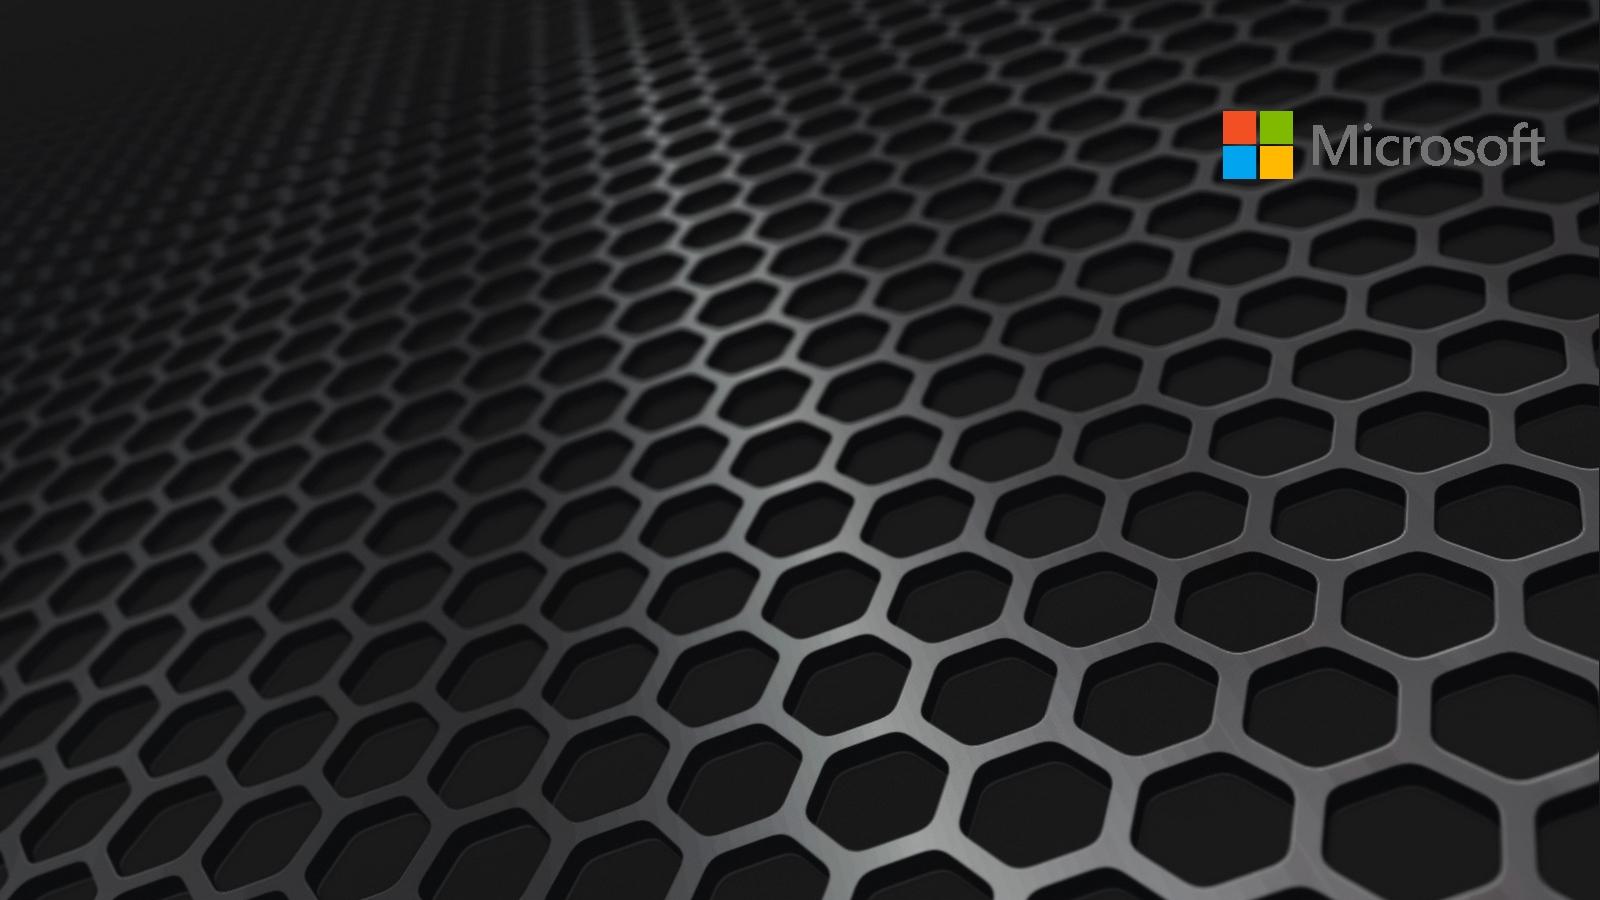 Eyesurfing - Microsoft wallpaper ...